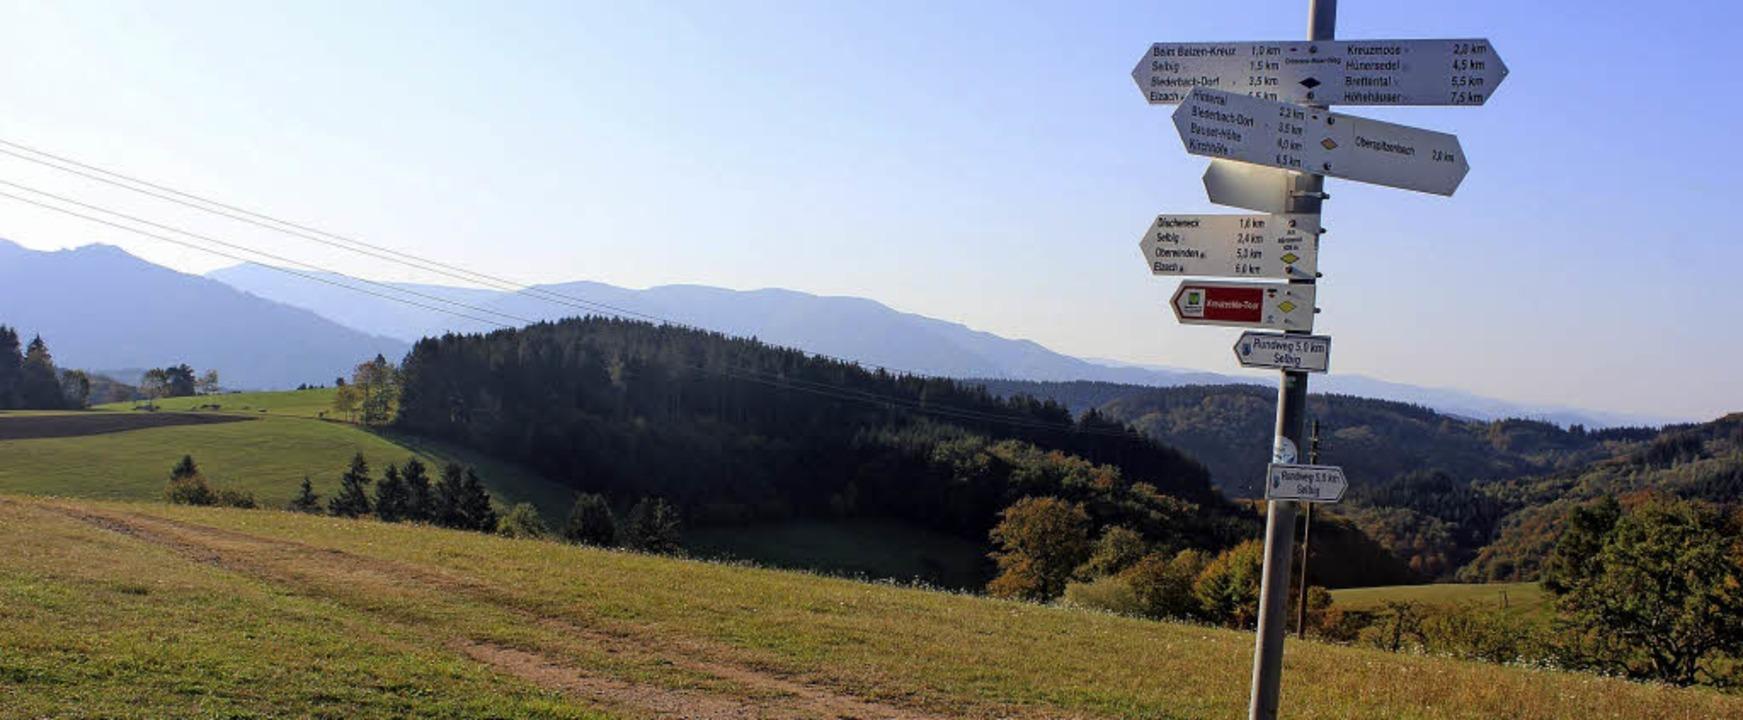 Wunderbare Wanderungen gibt's im... Herbstwetter (Biederbach-Bäreneckle).  | Foto: Bernd Fackler